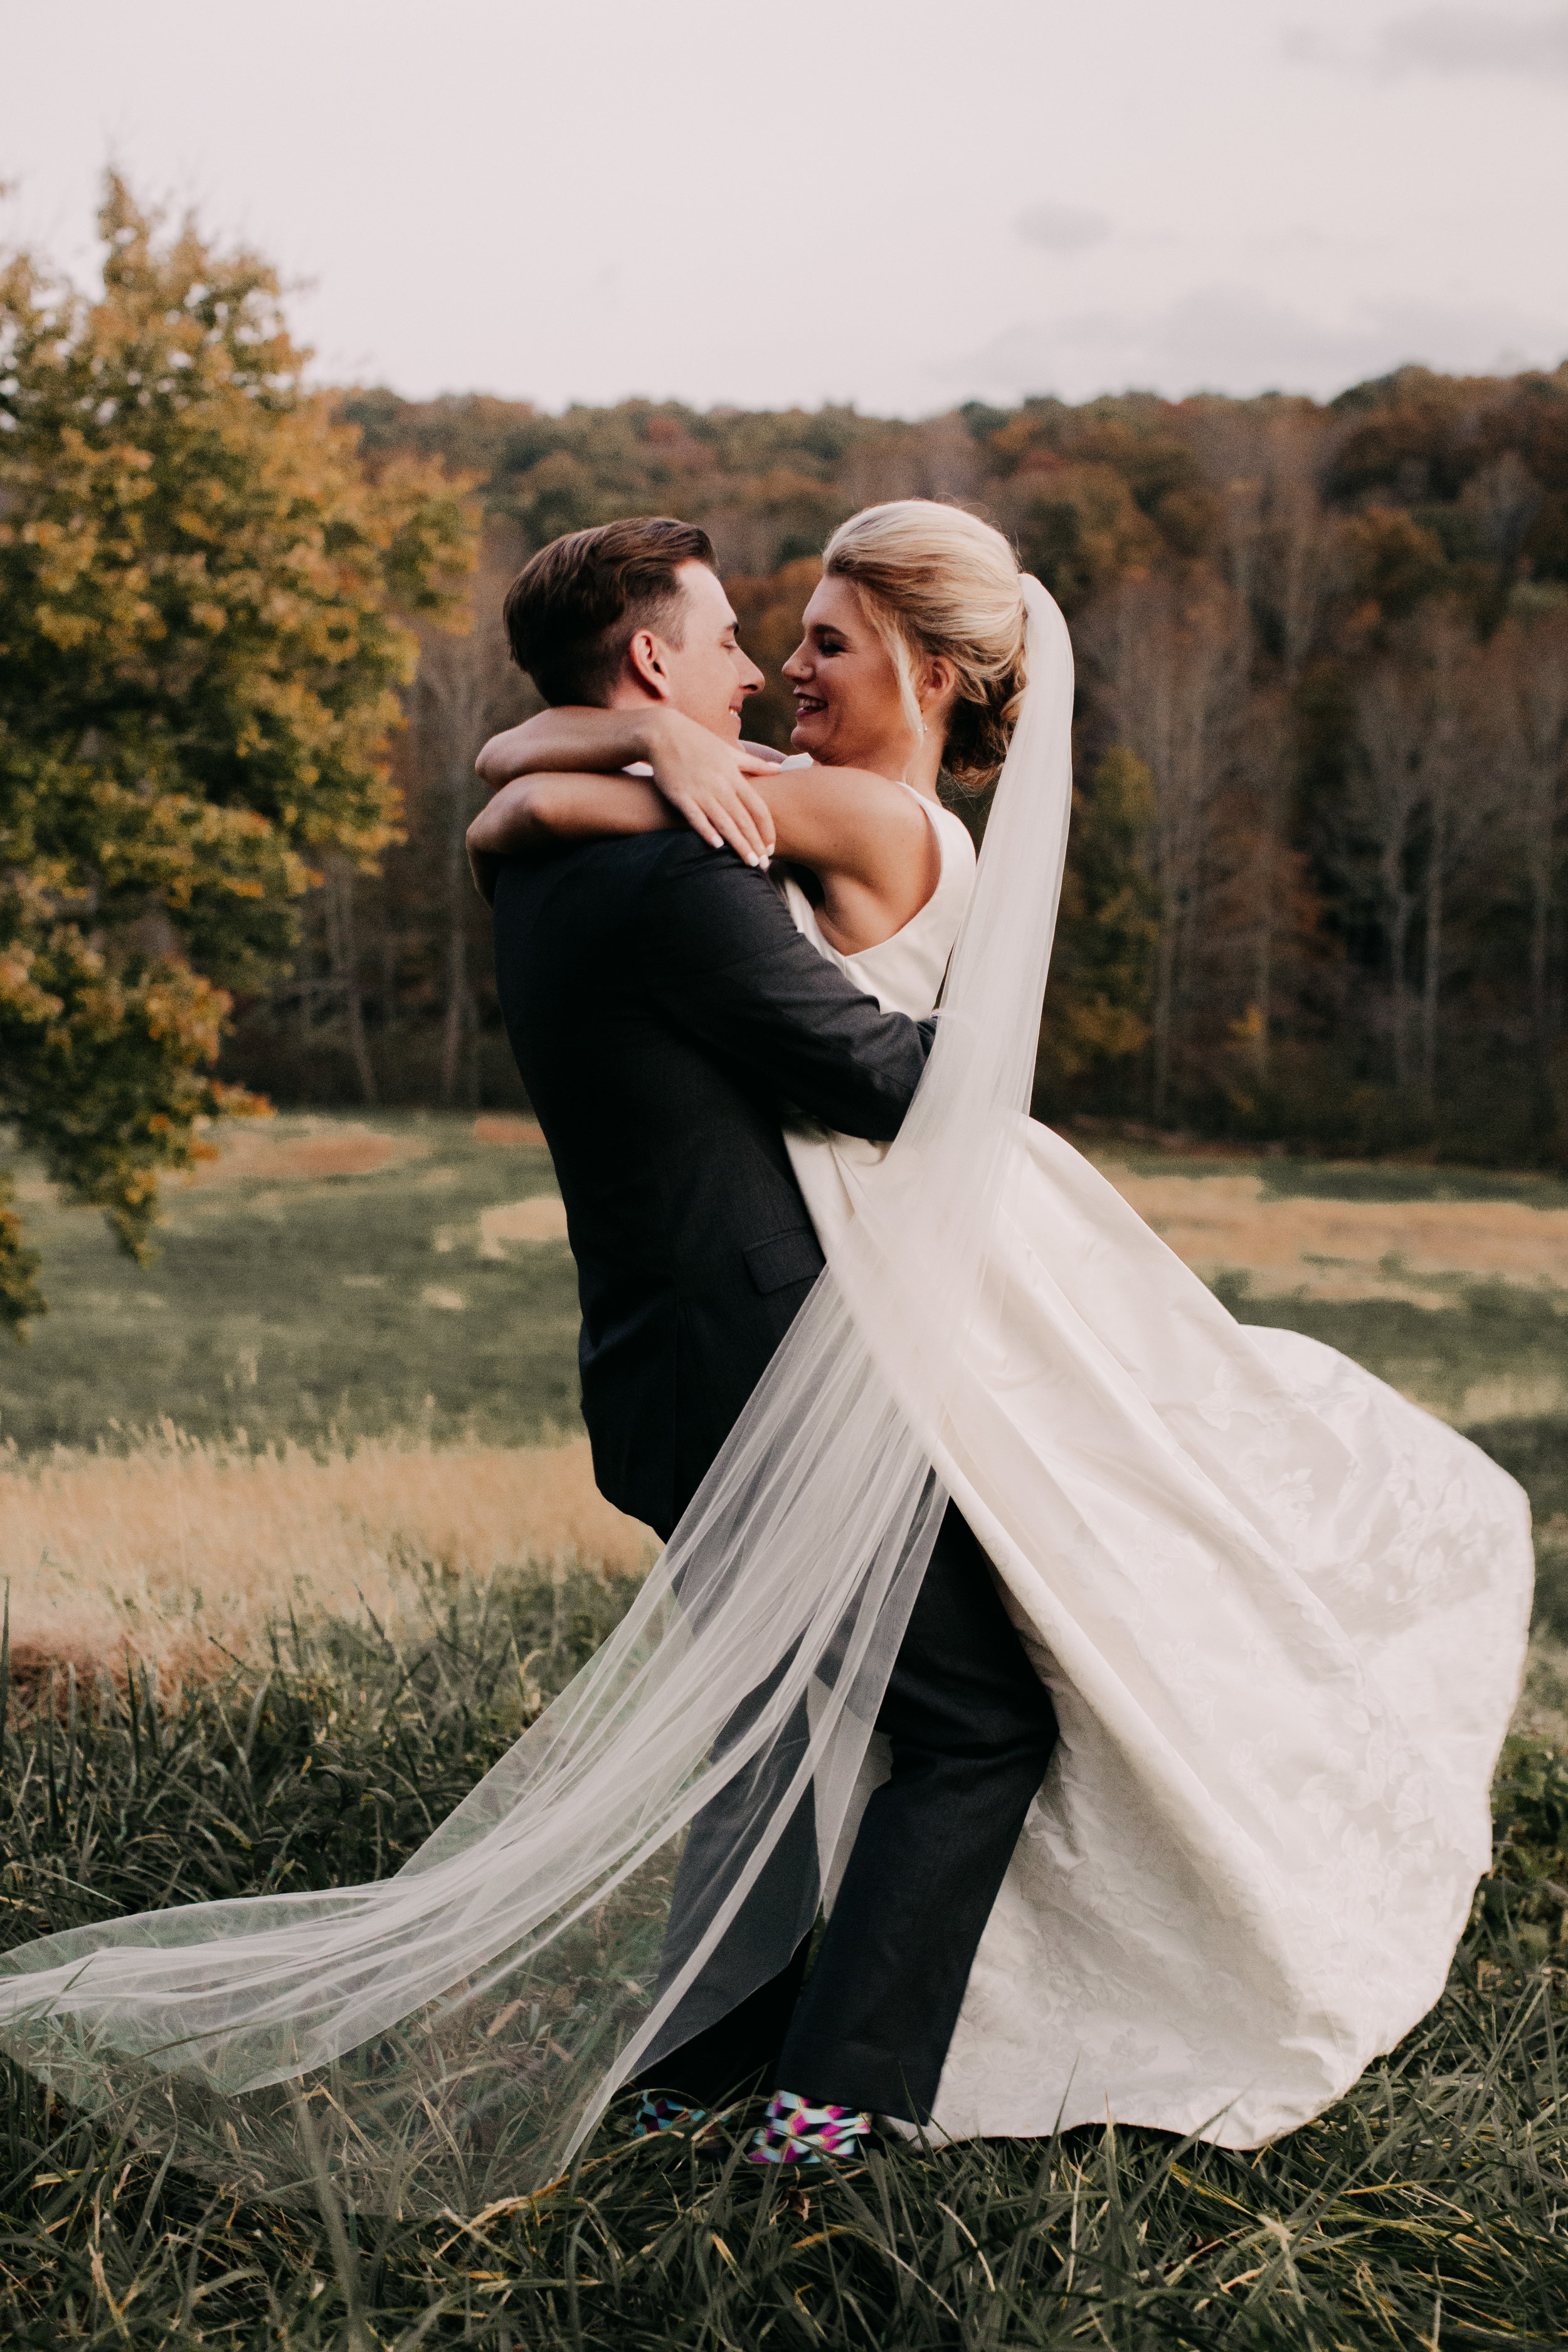 Kaylyn & Ryan Final Wedding Photos448.jpg